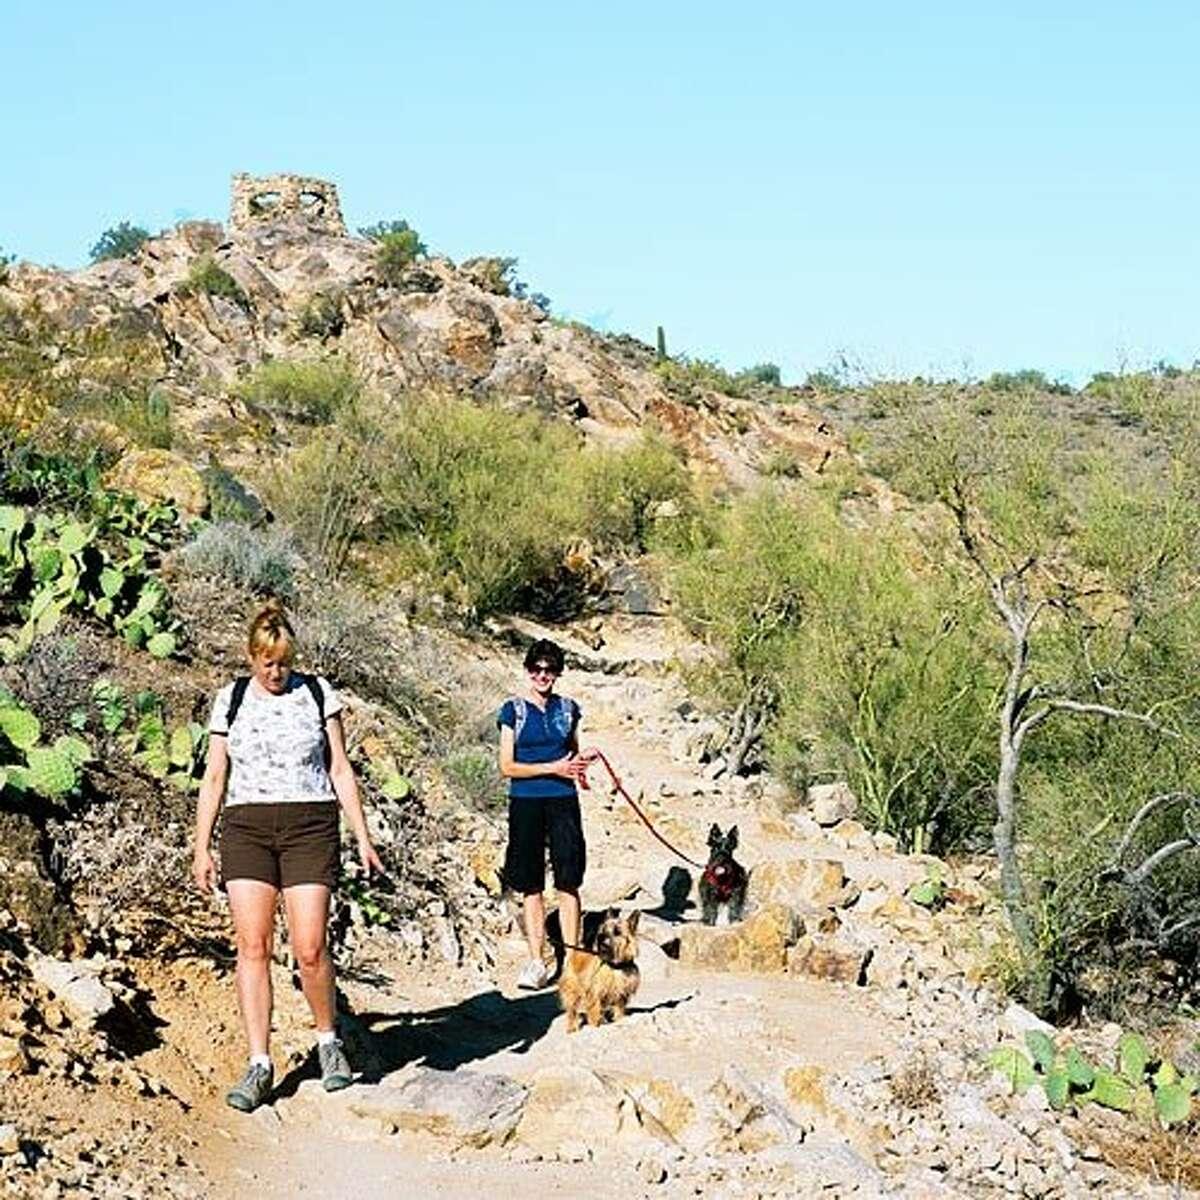 19. Phoenix, ArizonaOverall score: 7.0Quality of life: 6.8Value: 6.6